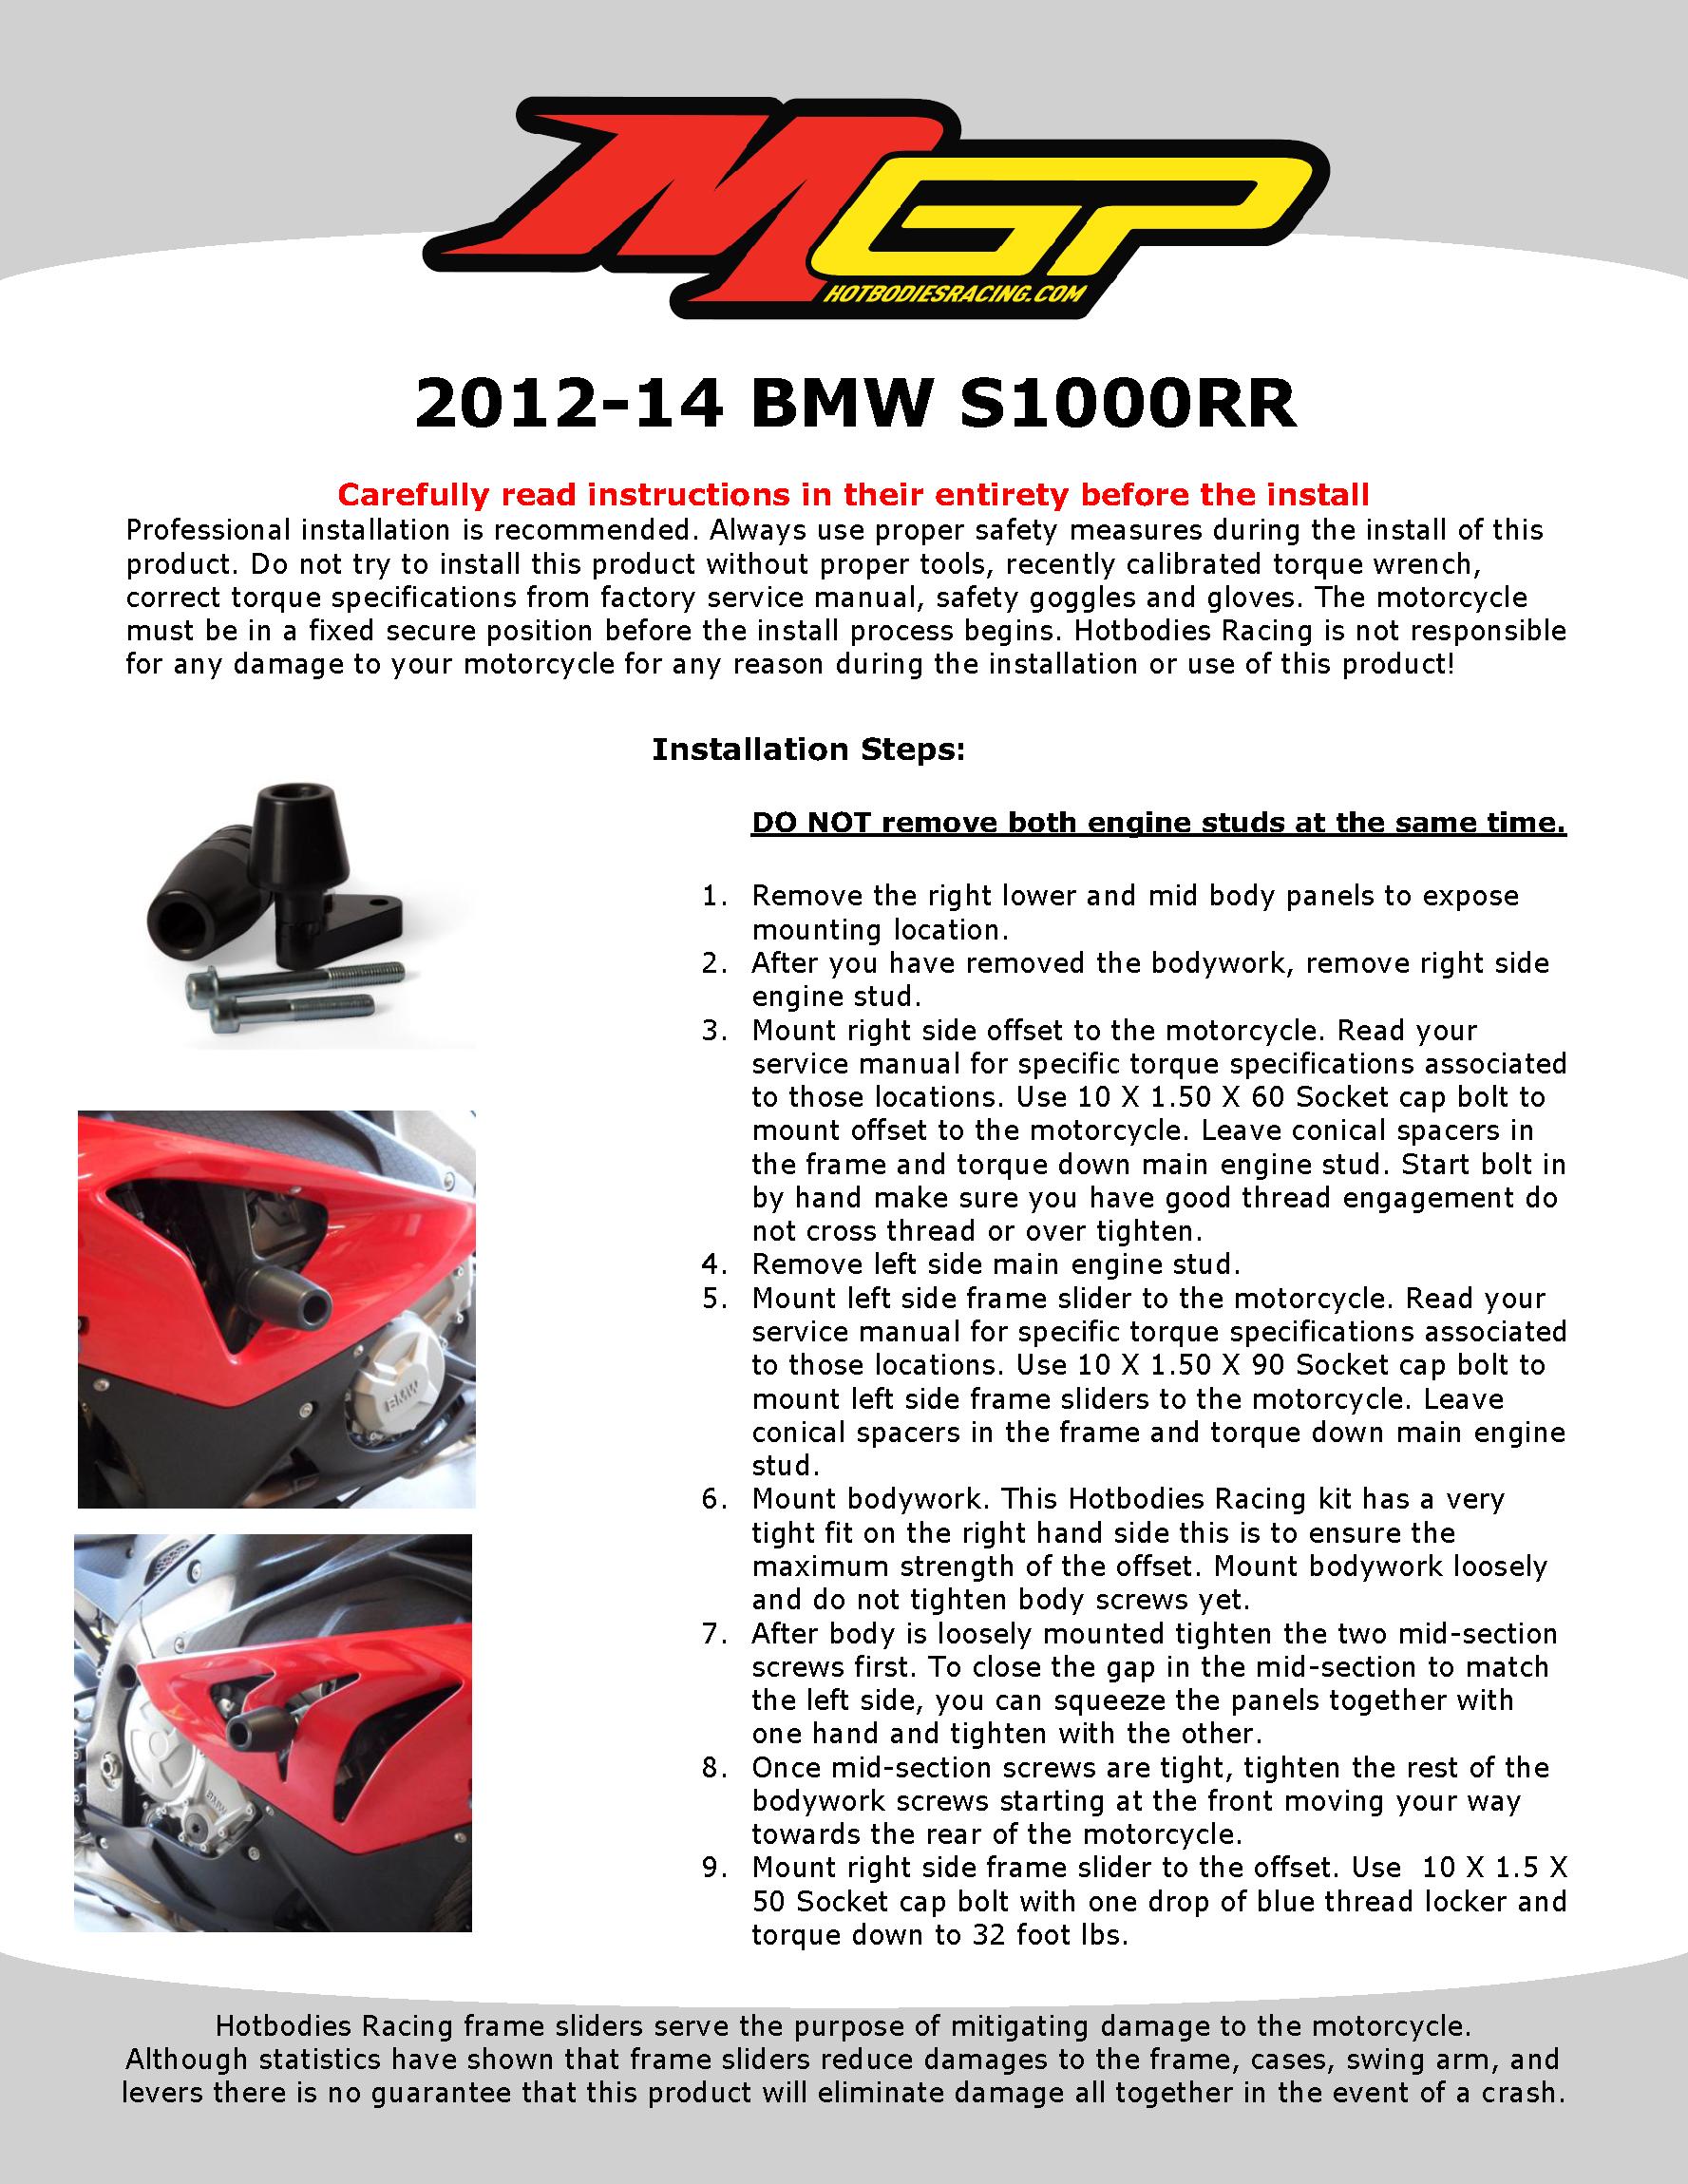 S1000RR 2012-14 NO CUT Frame Sliders